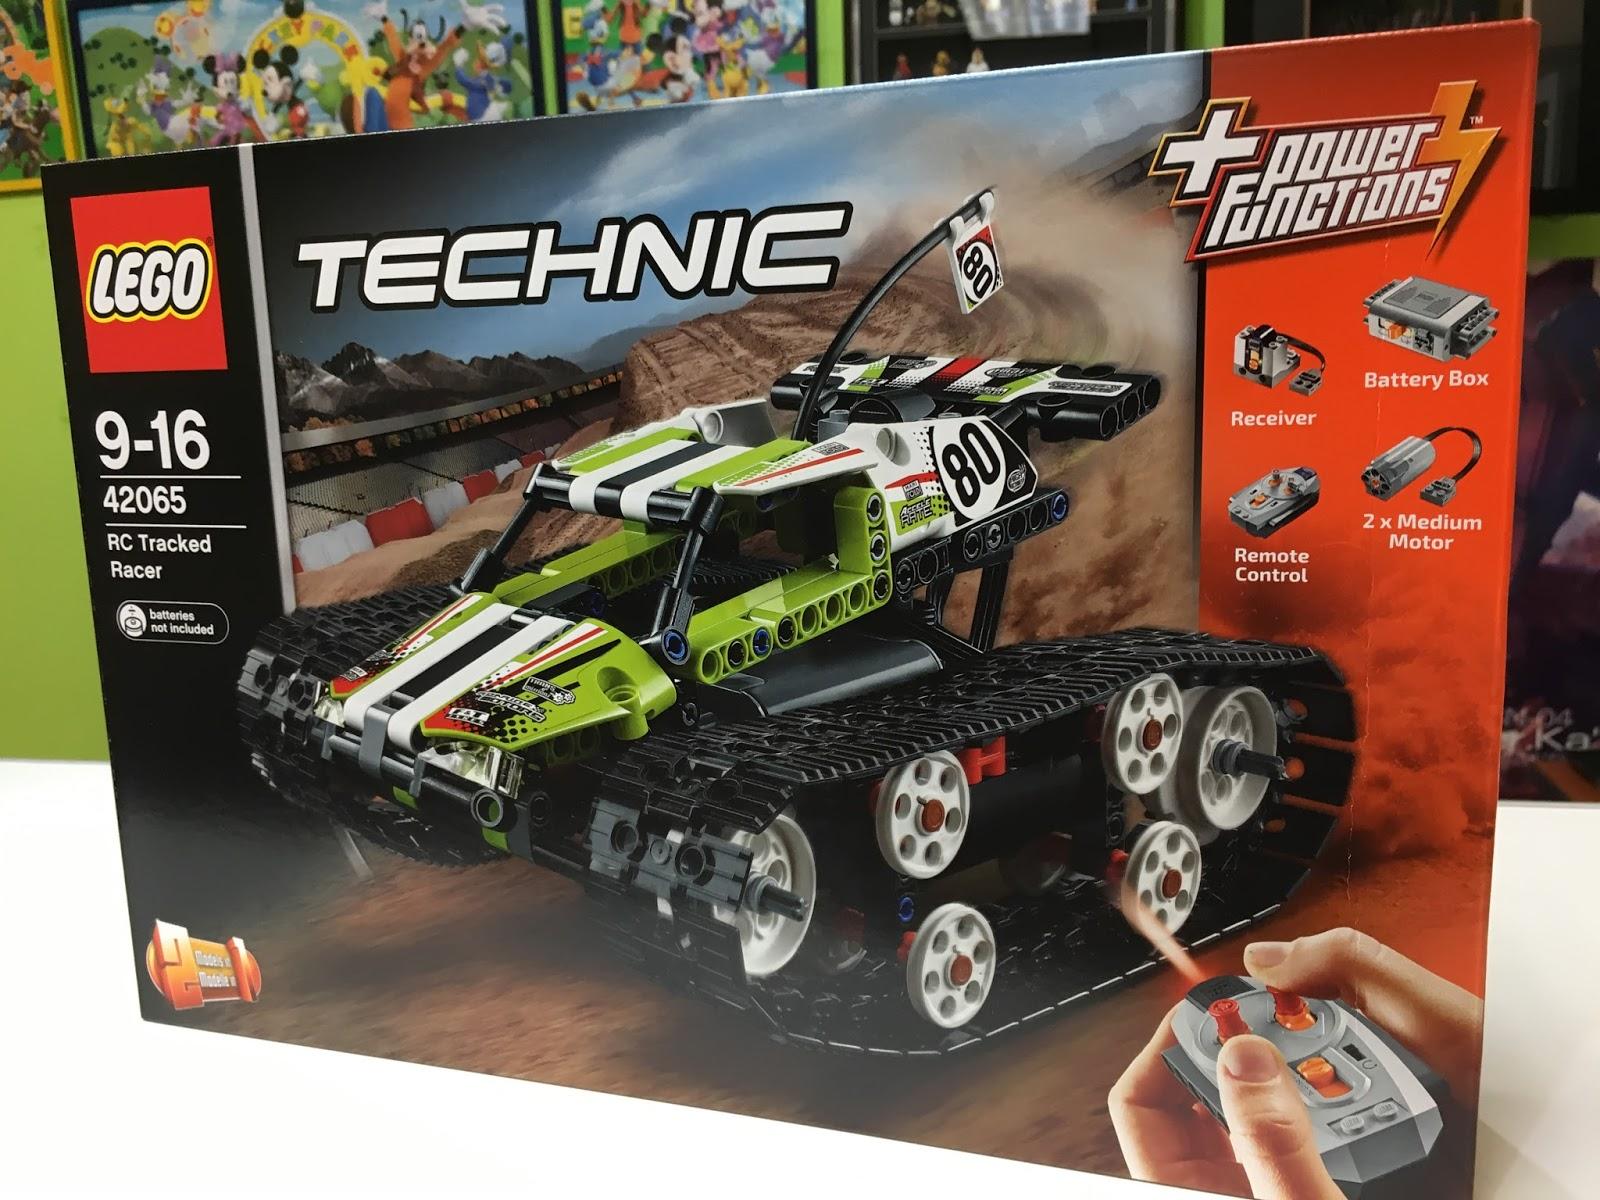 DeToyz Shop: 2017 LEGO Creator & Technic sets new arrival